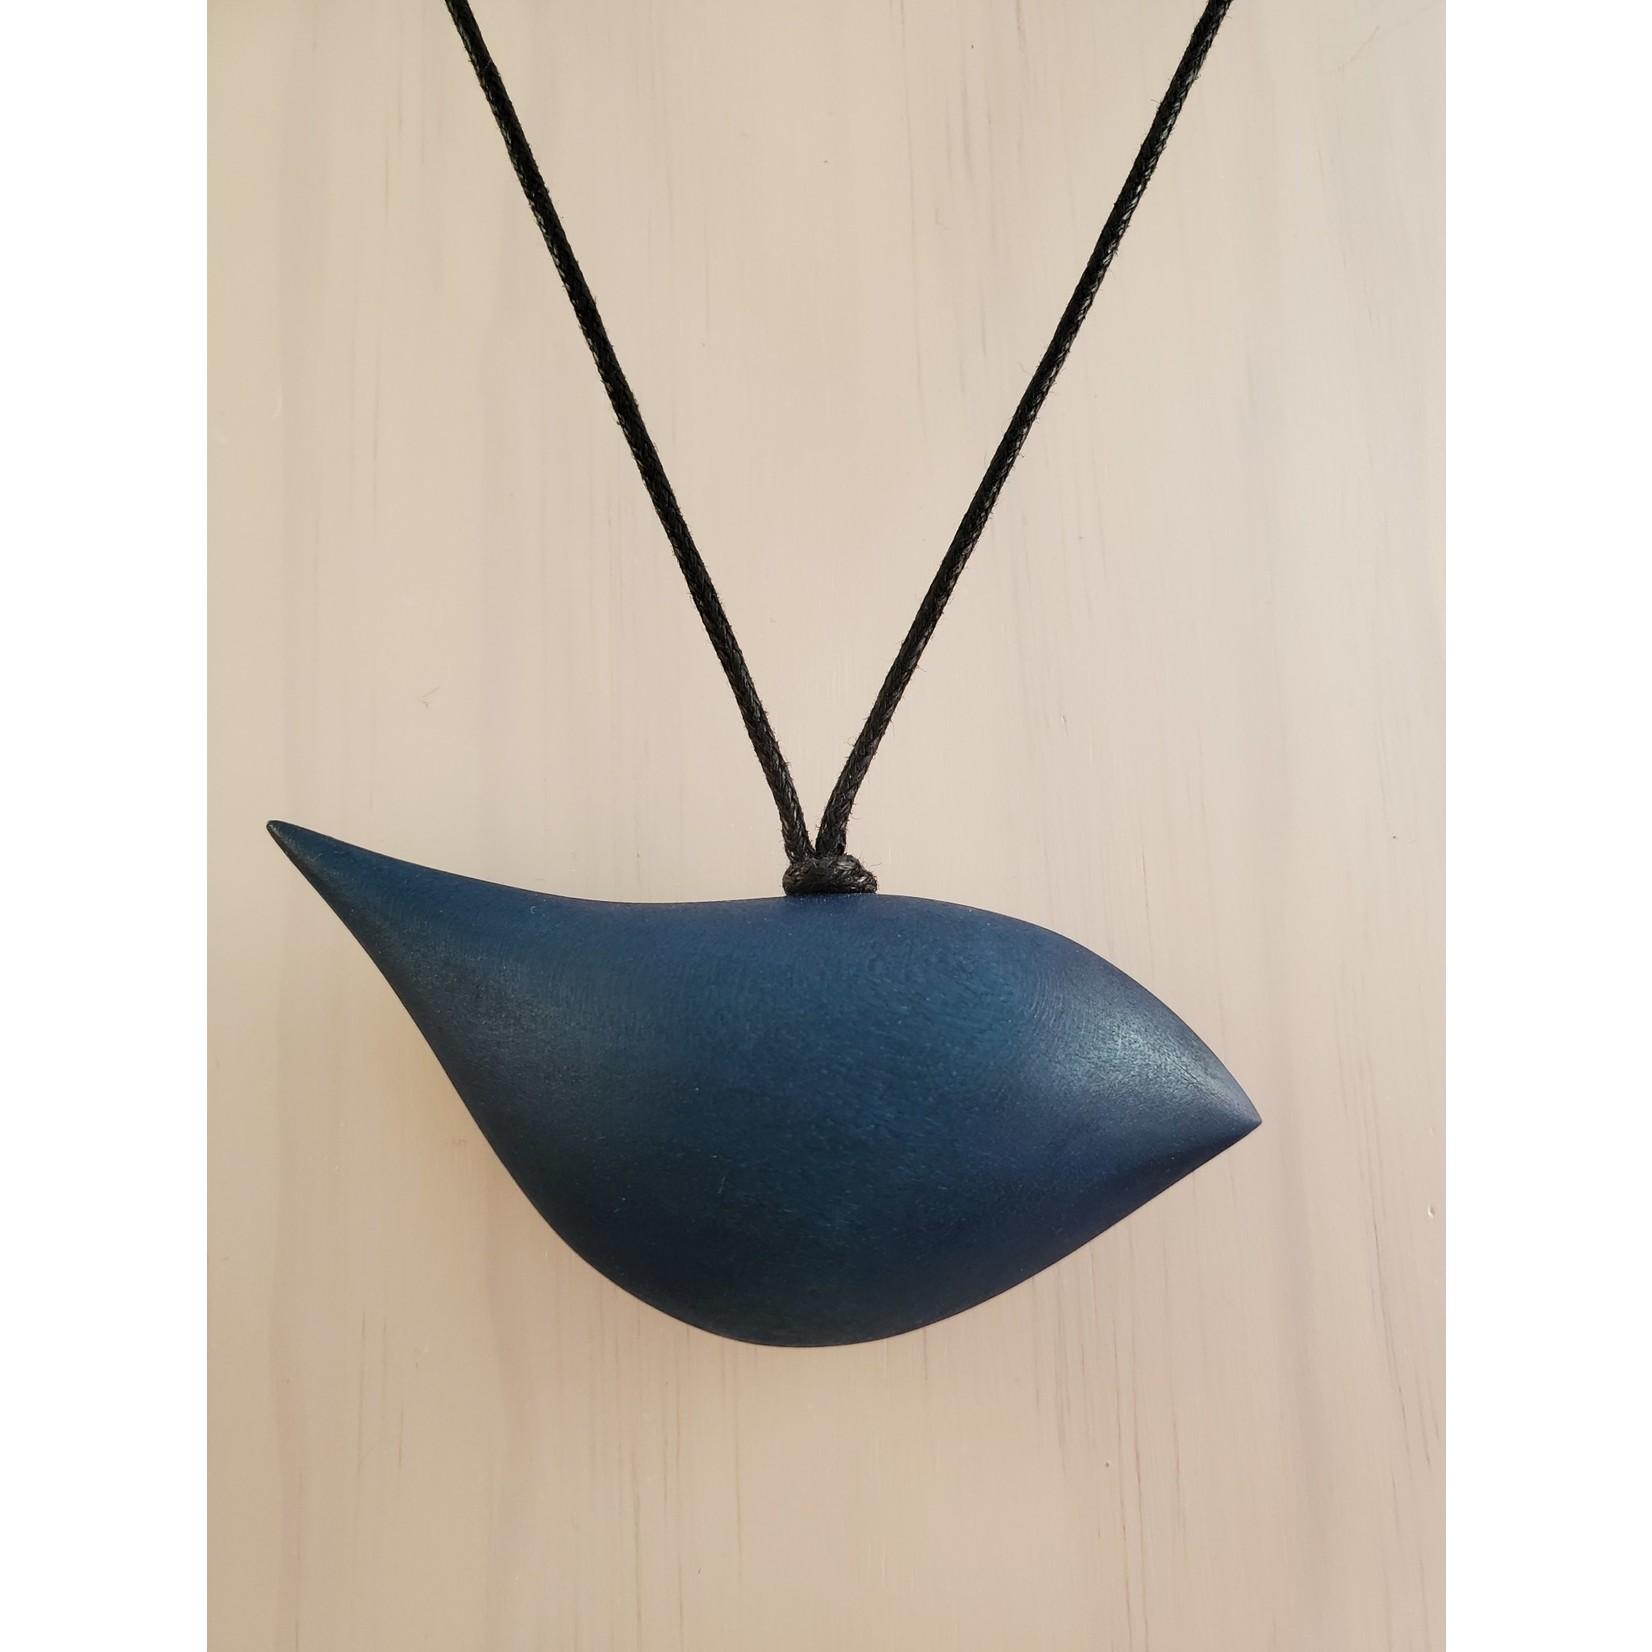 Blue Wood Bird Necklace On Adjustable Cord